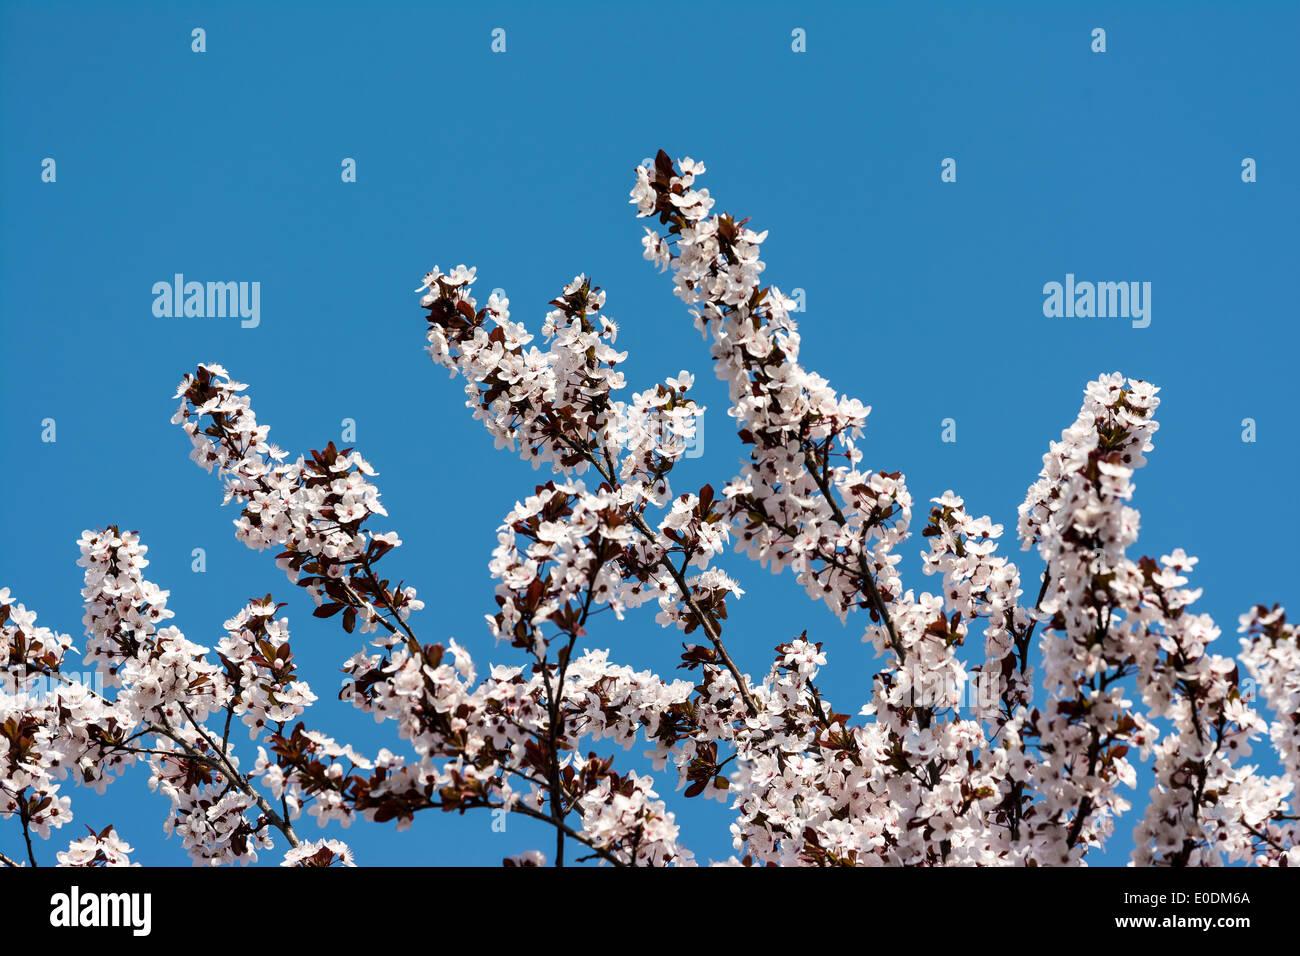 Plum Tree White Flowers Spring Blossom Stock Photo 69142706 Alamy